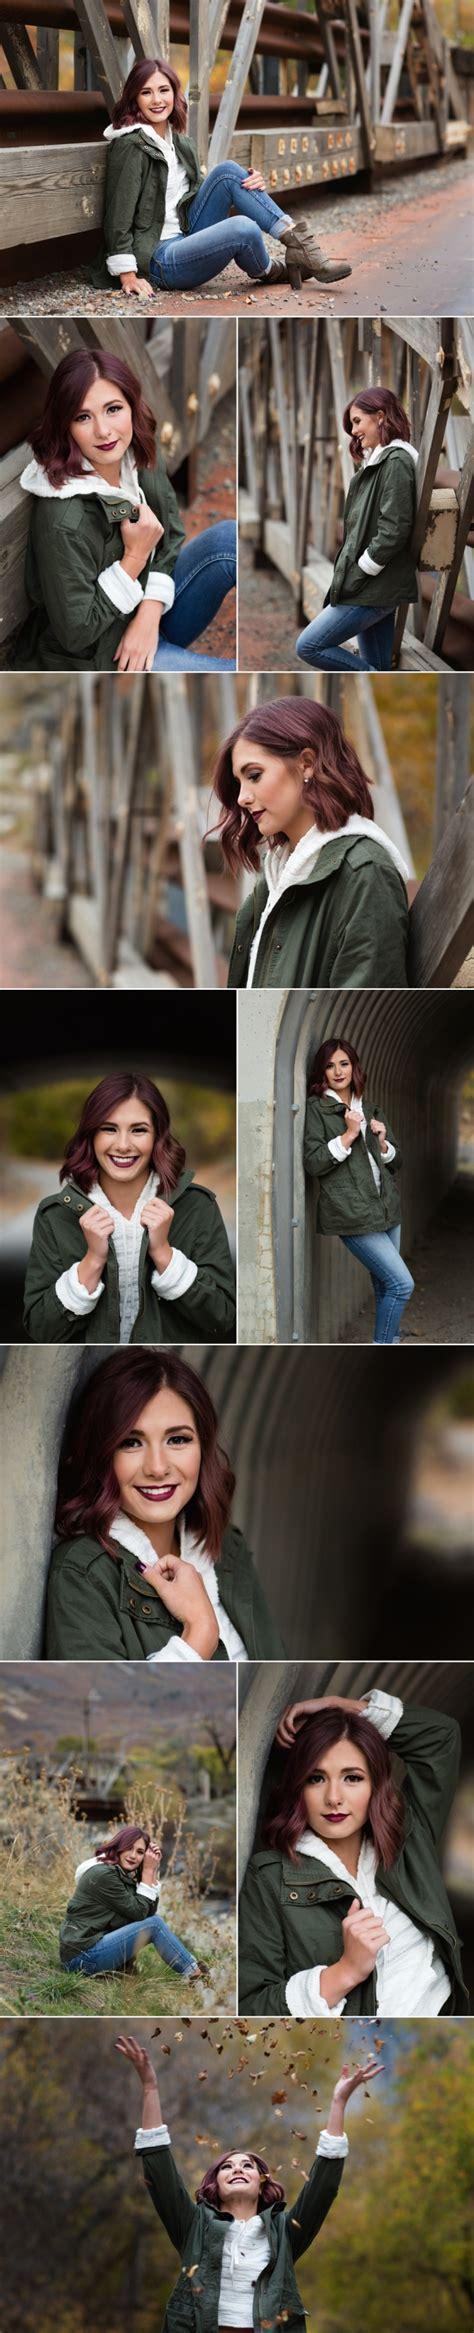 teonna class   utah senior photography chelsea